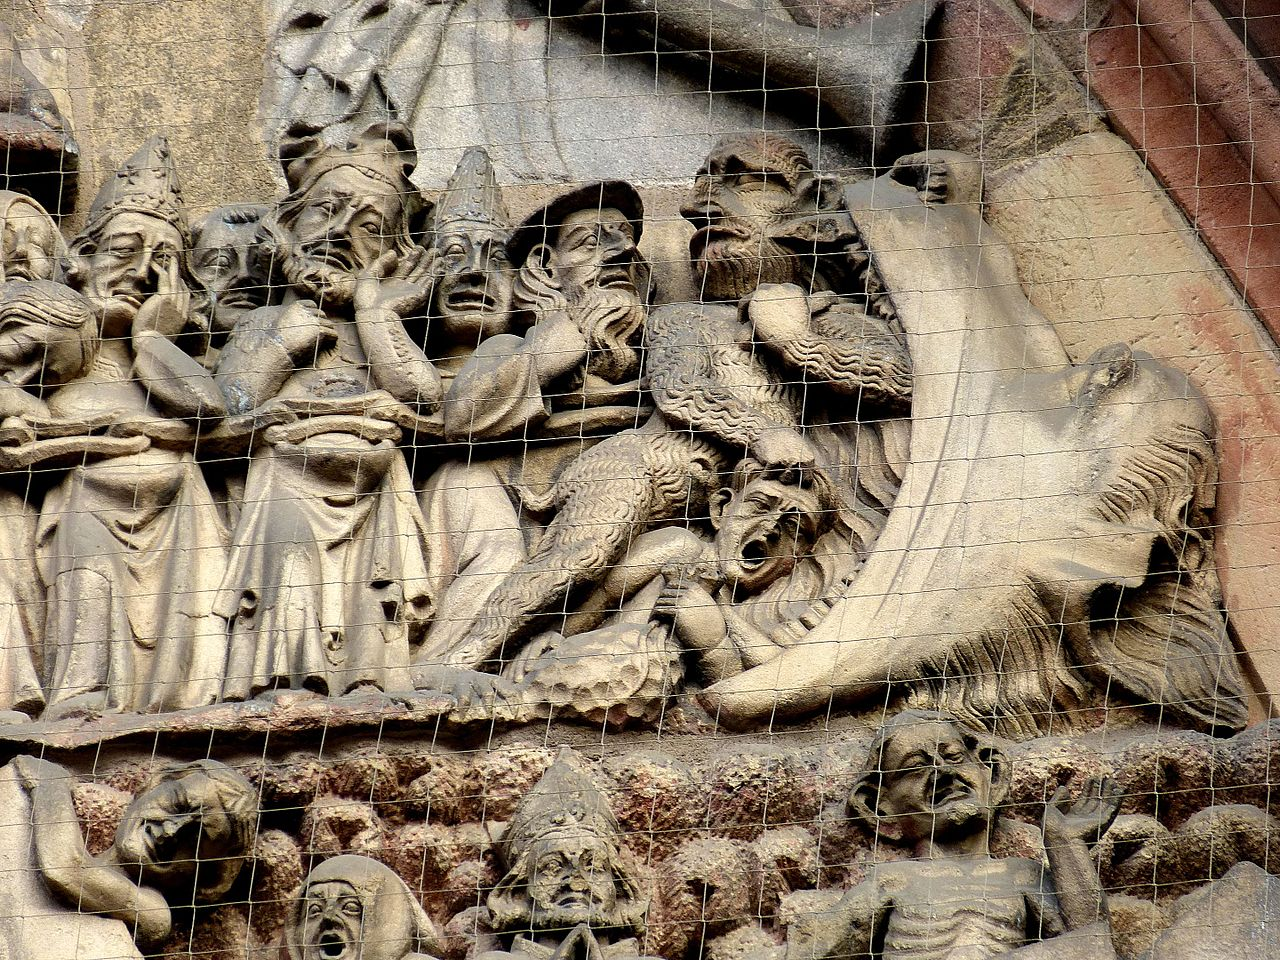 Nürnberg_Lorenzkirche_-_Westportal_4b_Jüngstes_Gericht_Hölle.jpg